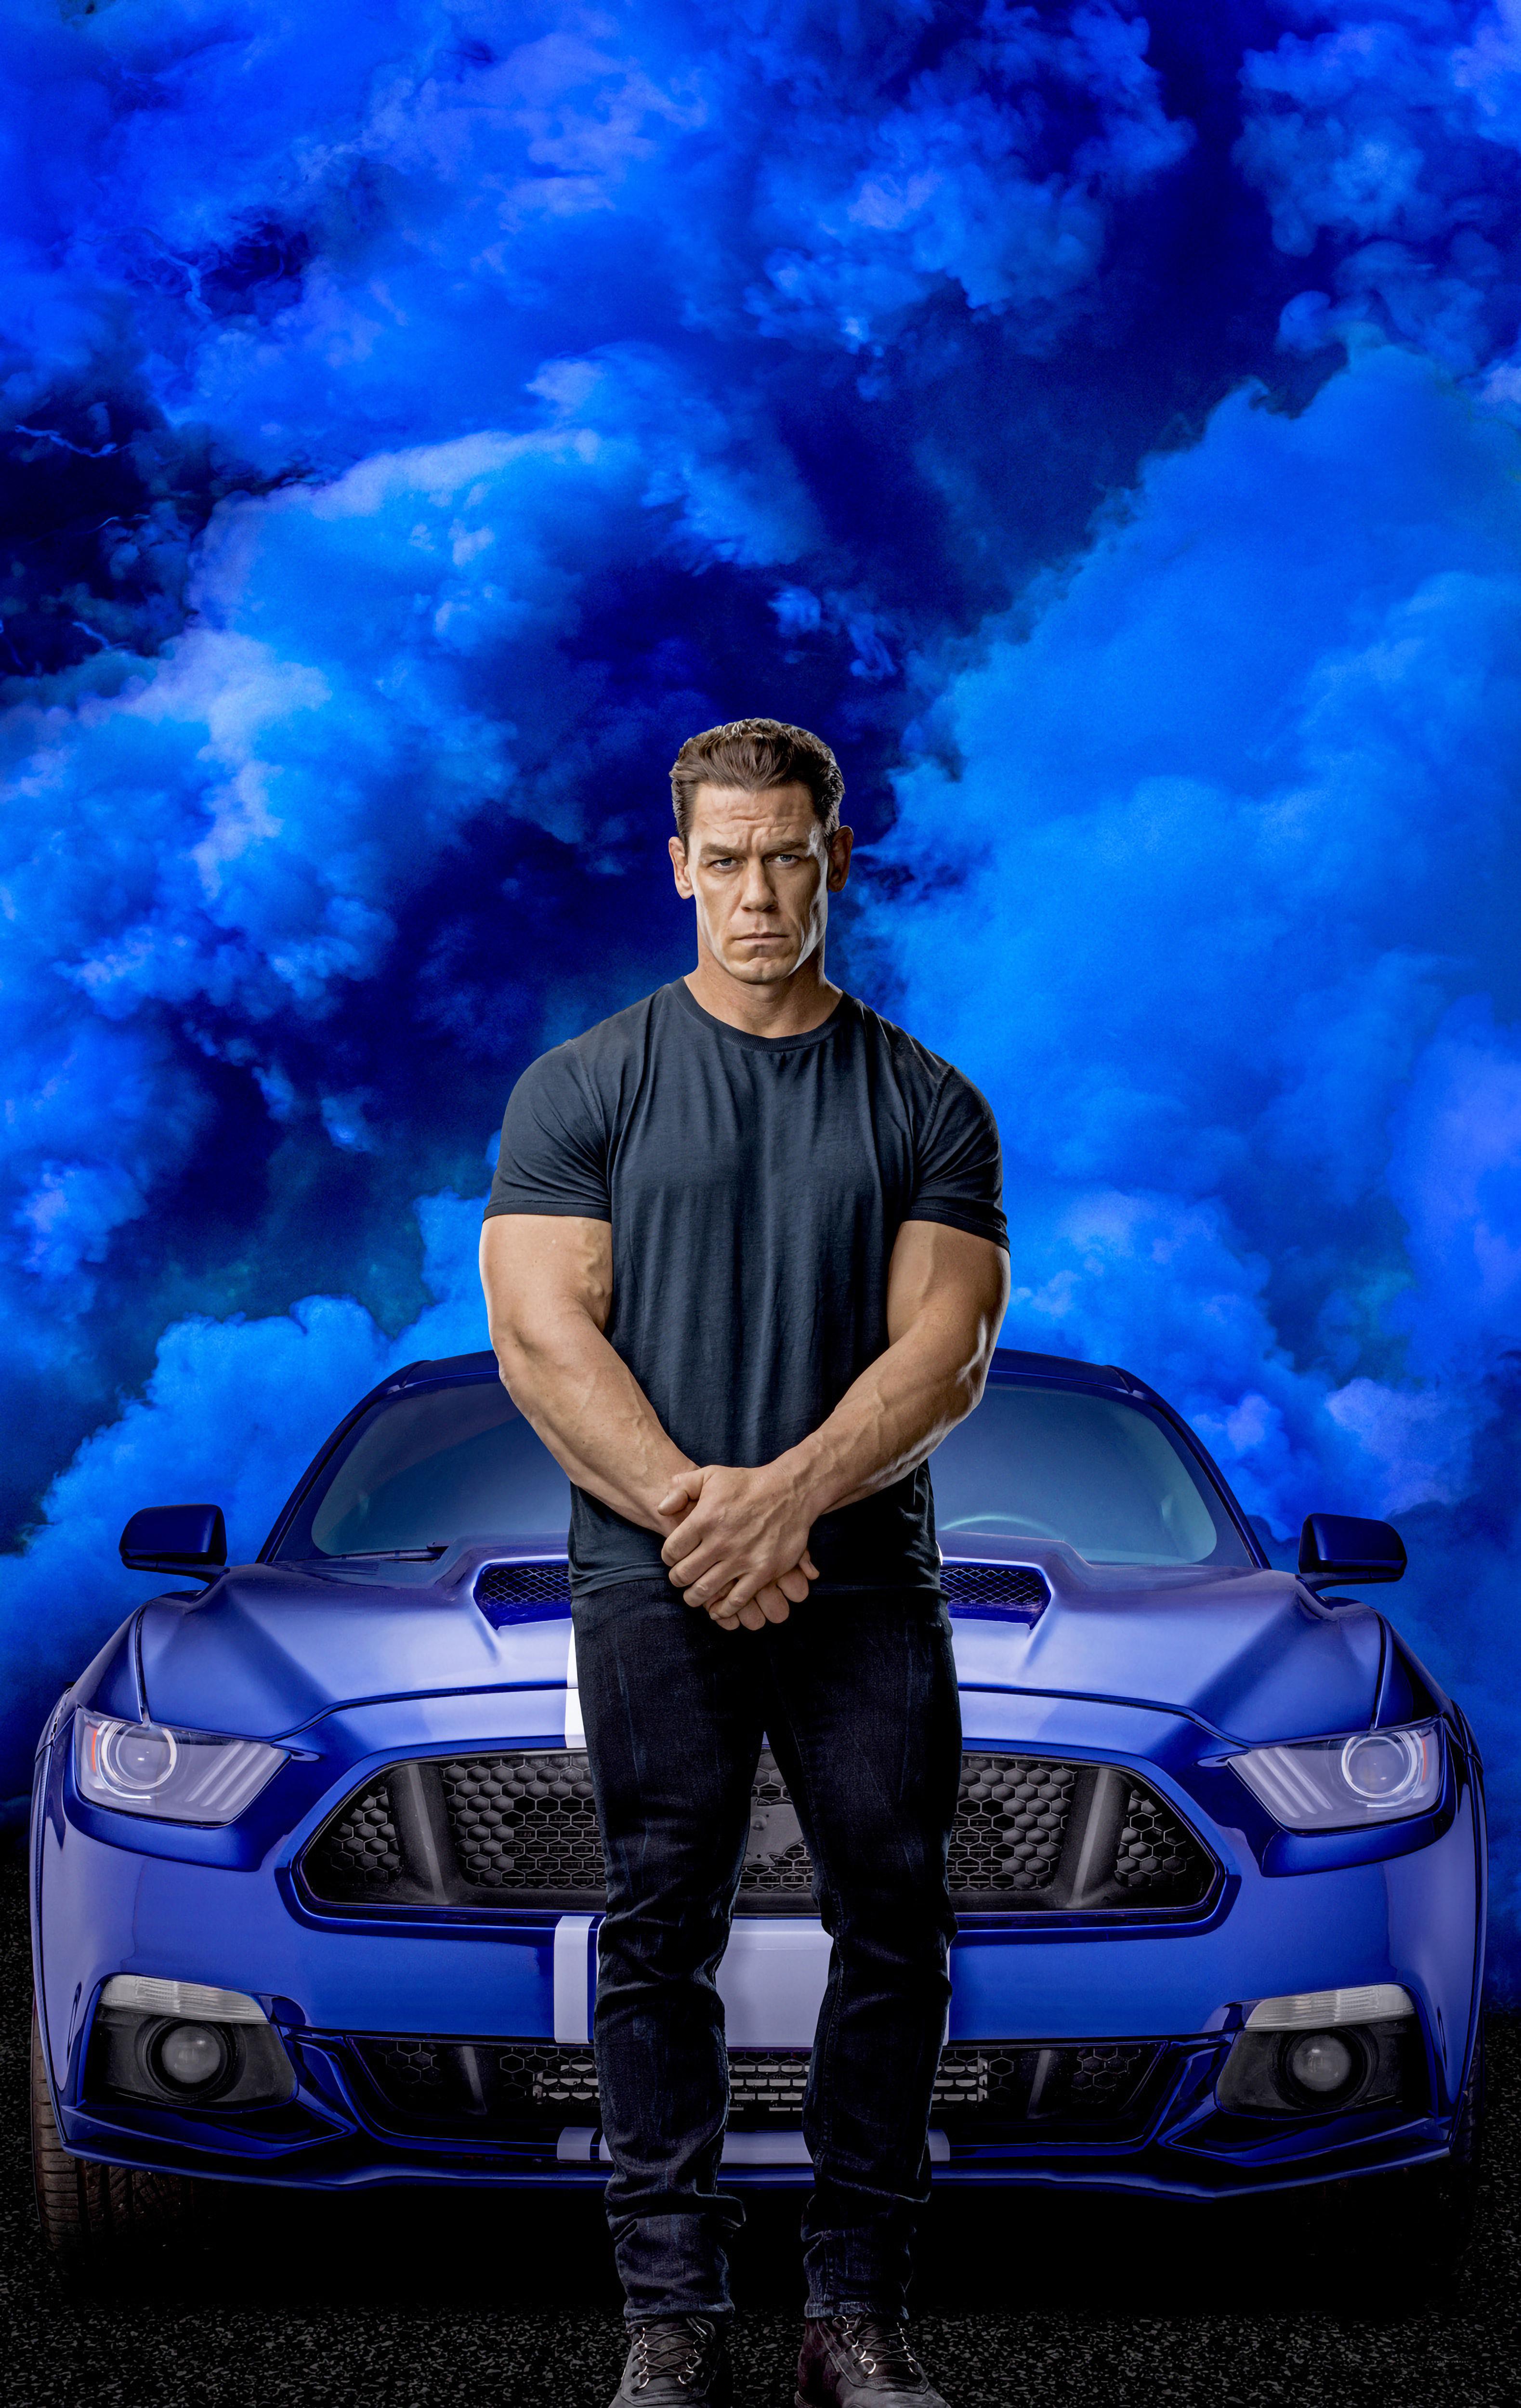 John Cena Fast And Furious 9 Wallpaper, HD Movies 4K ...